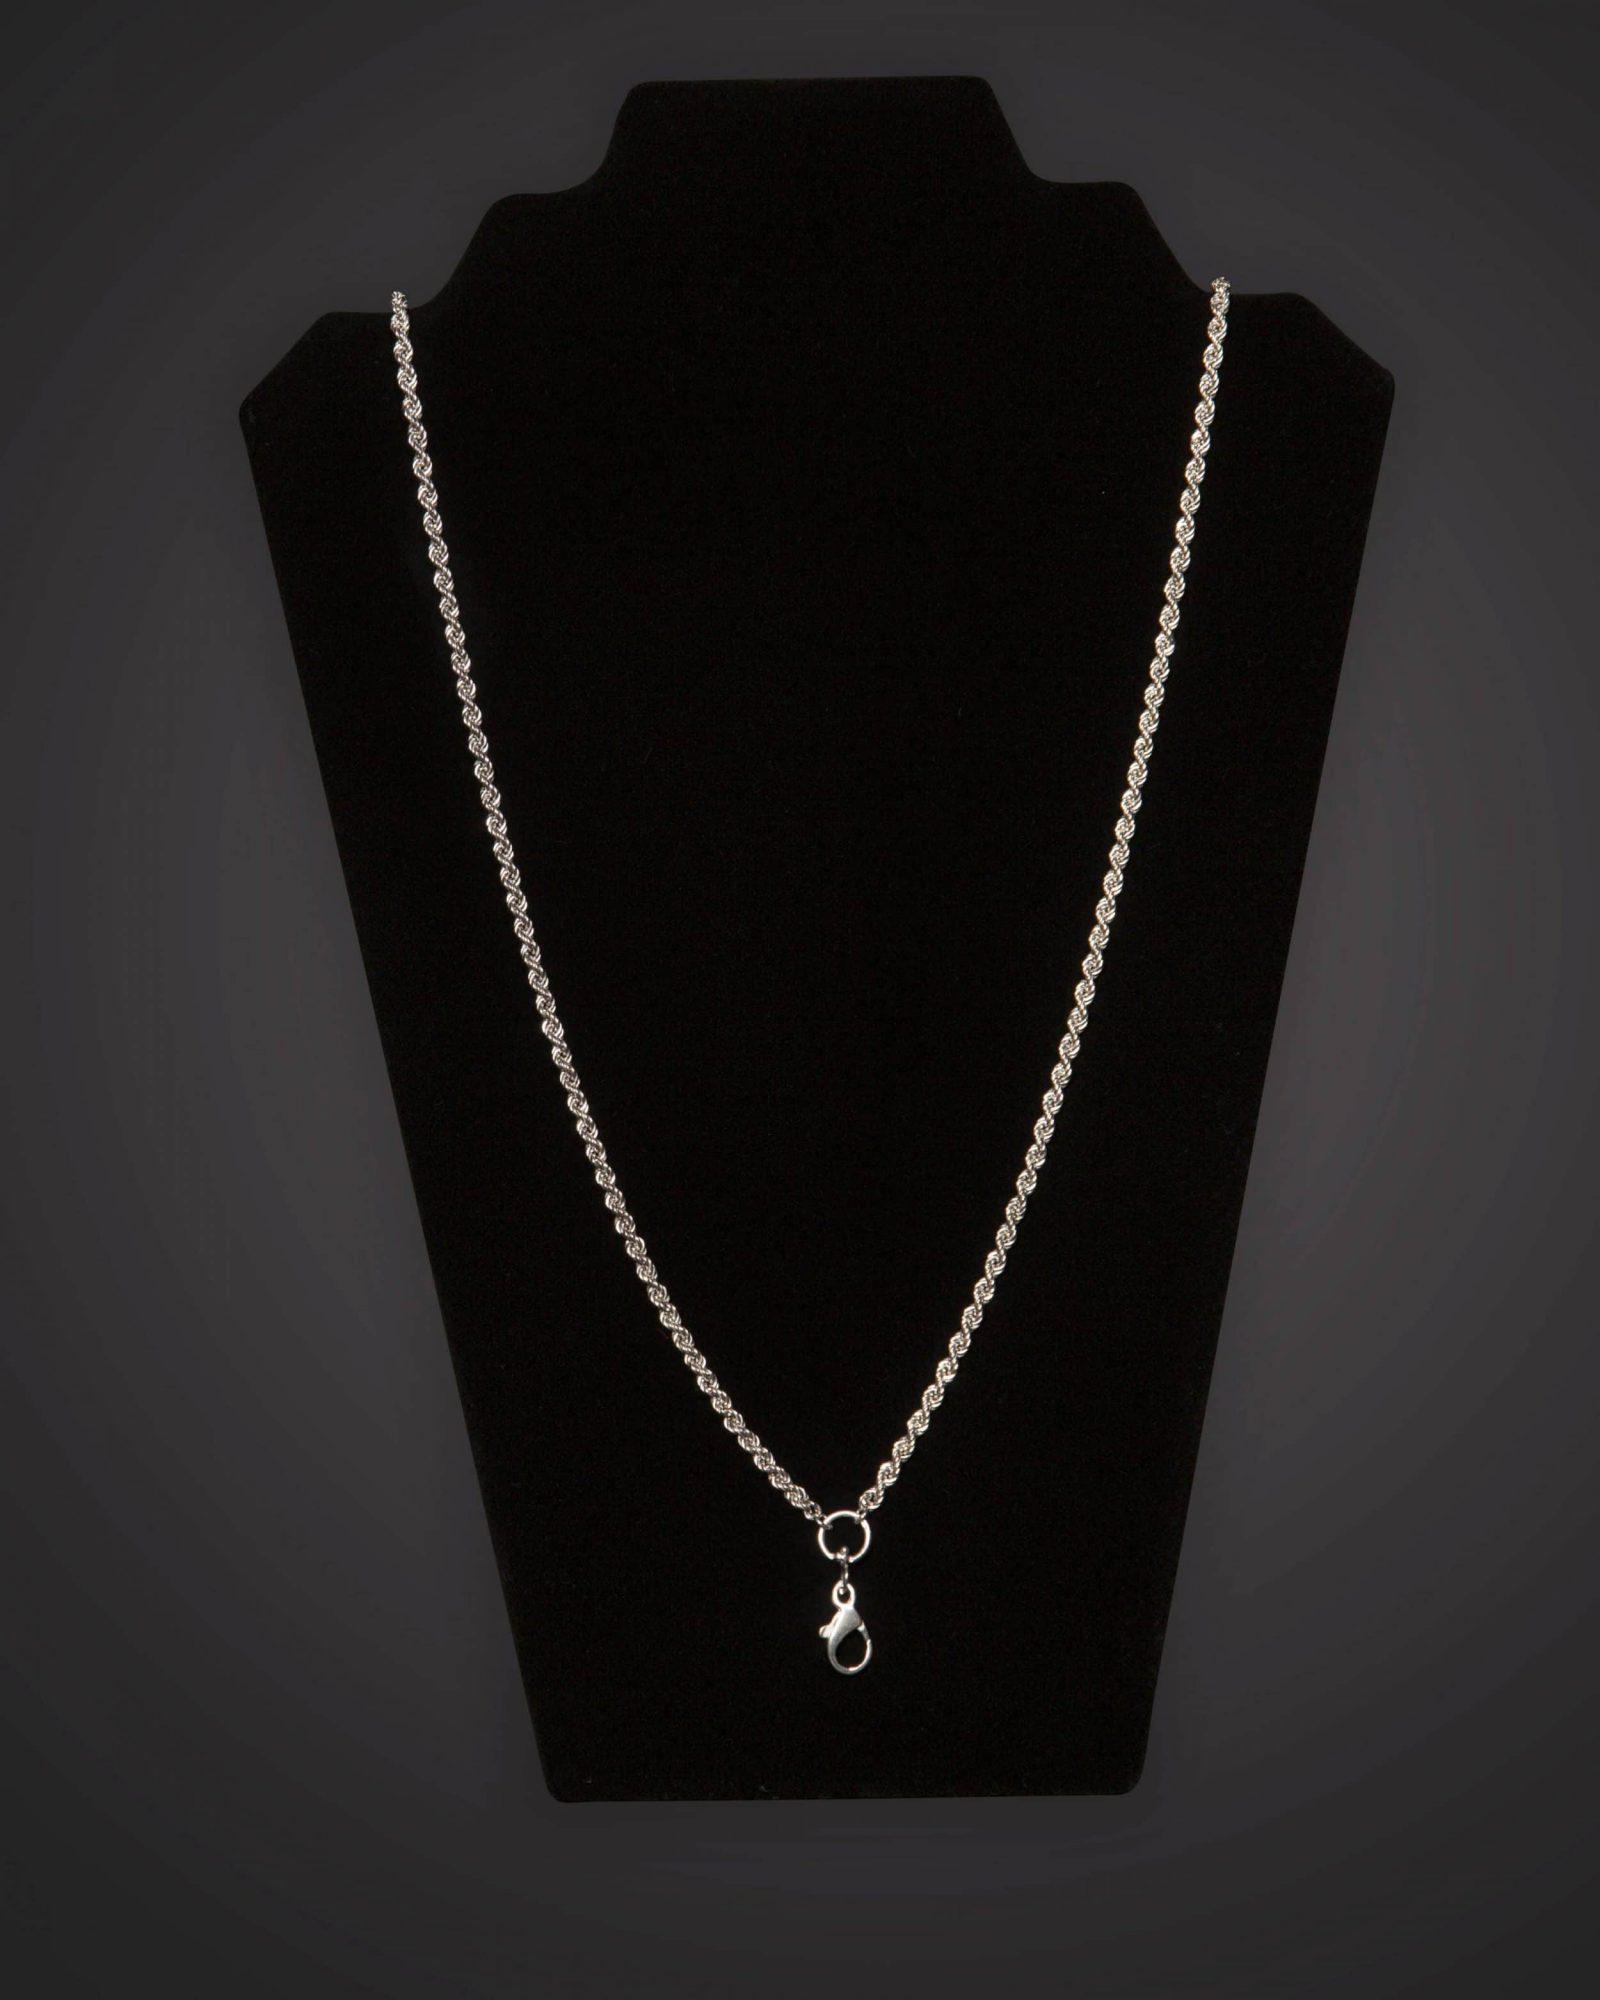 Pectoral Chain - Braided - Short - Silver Plated